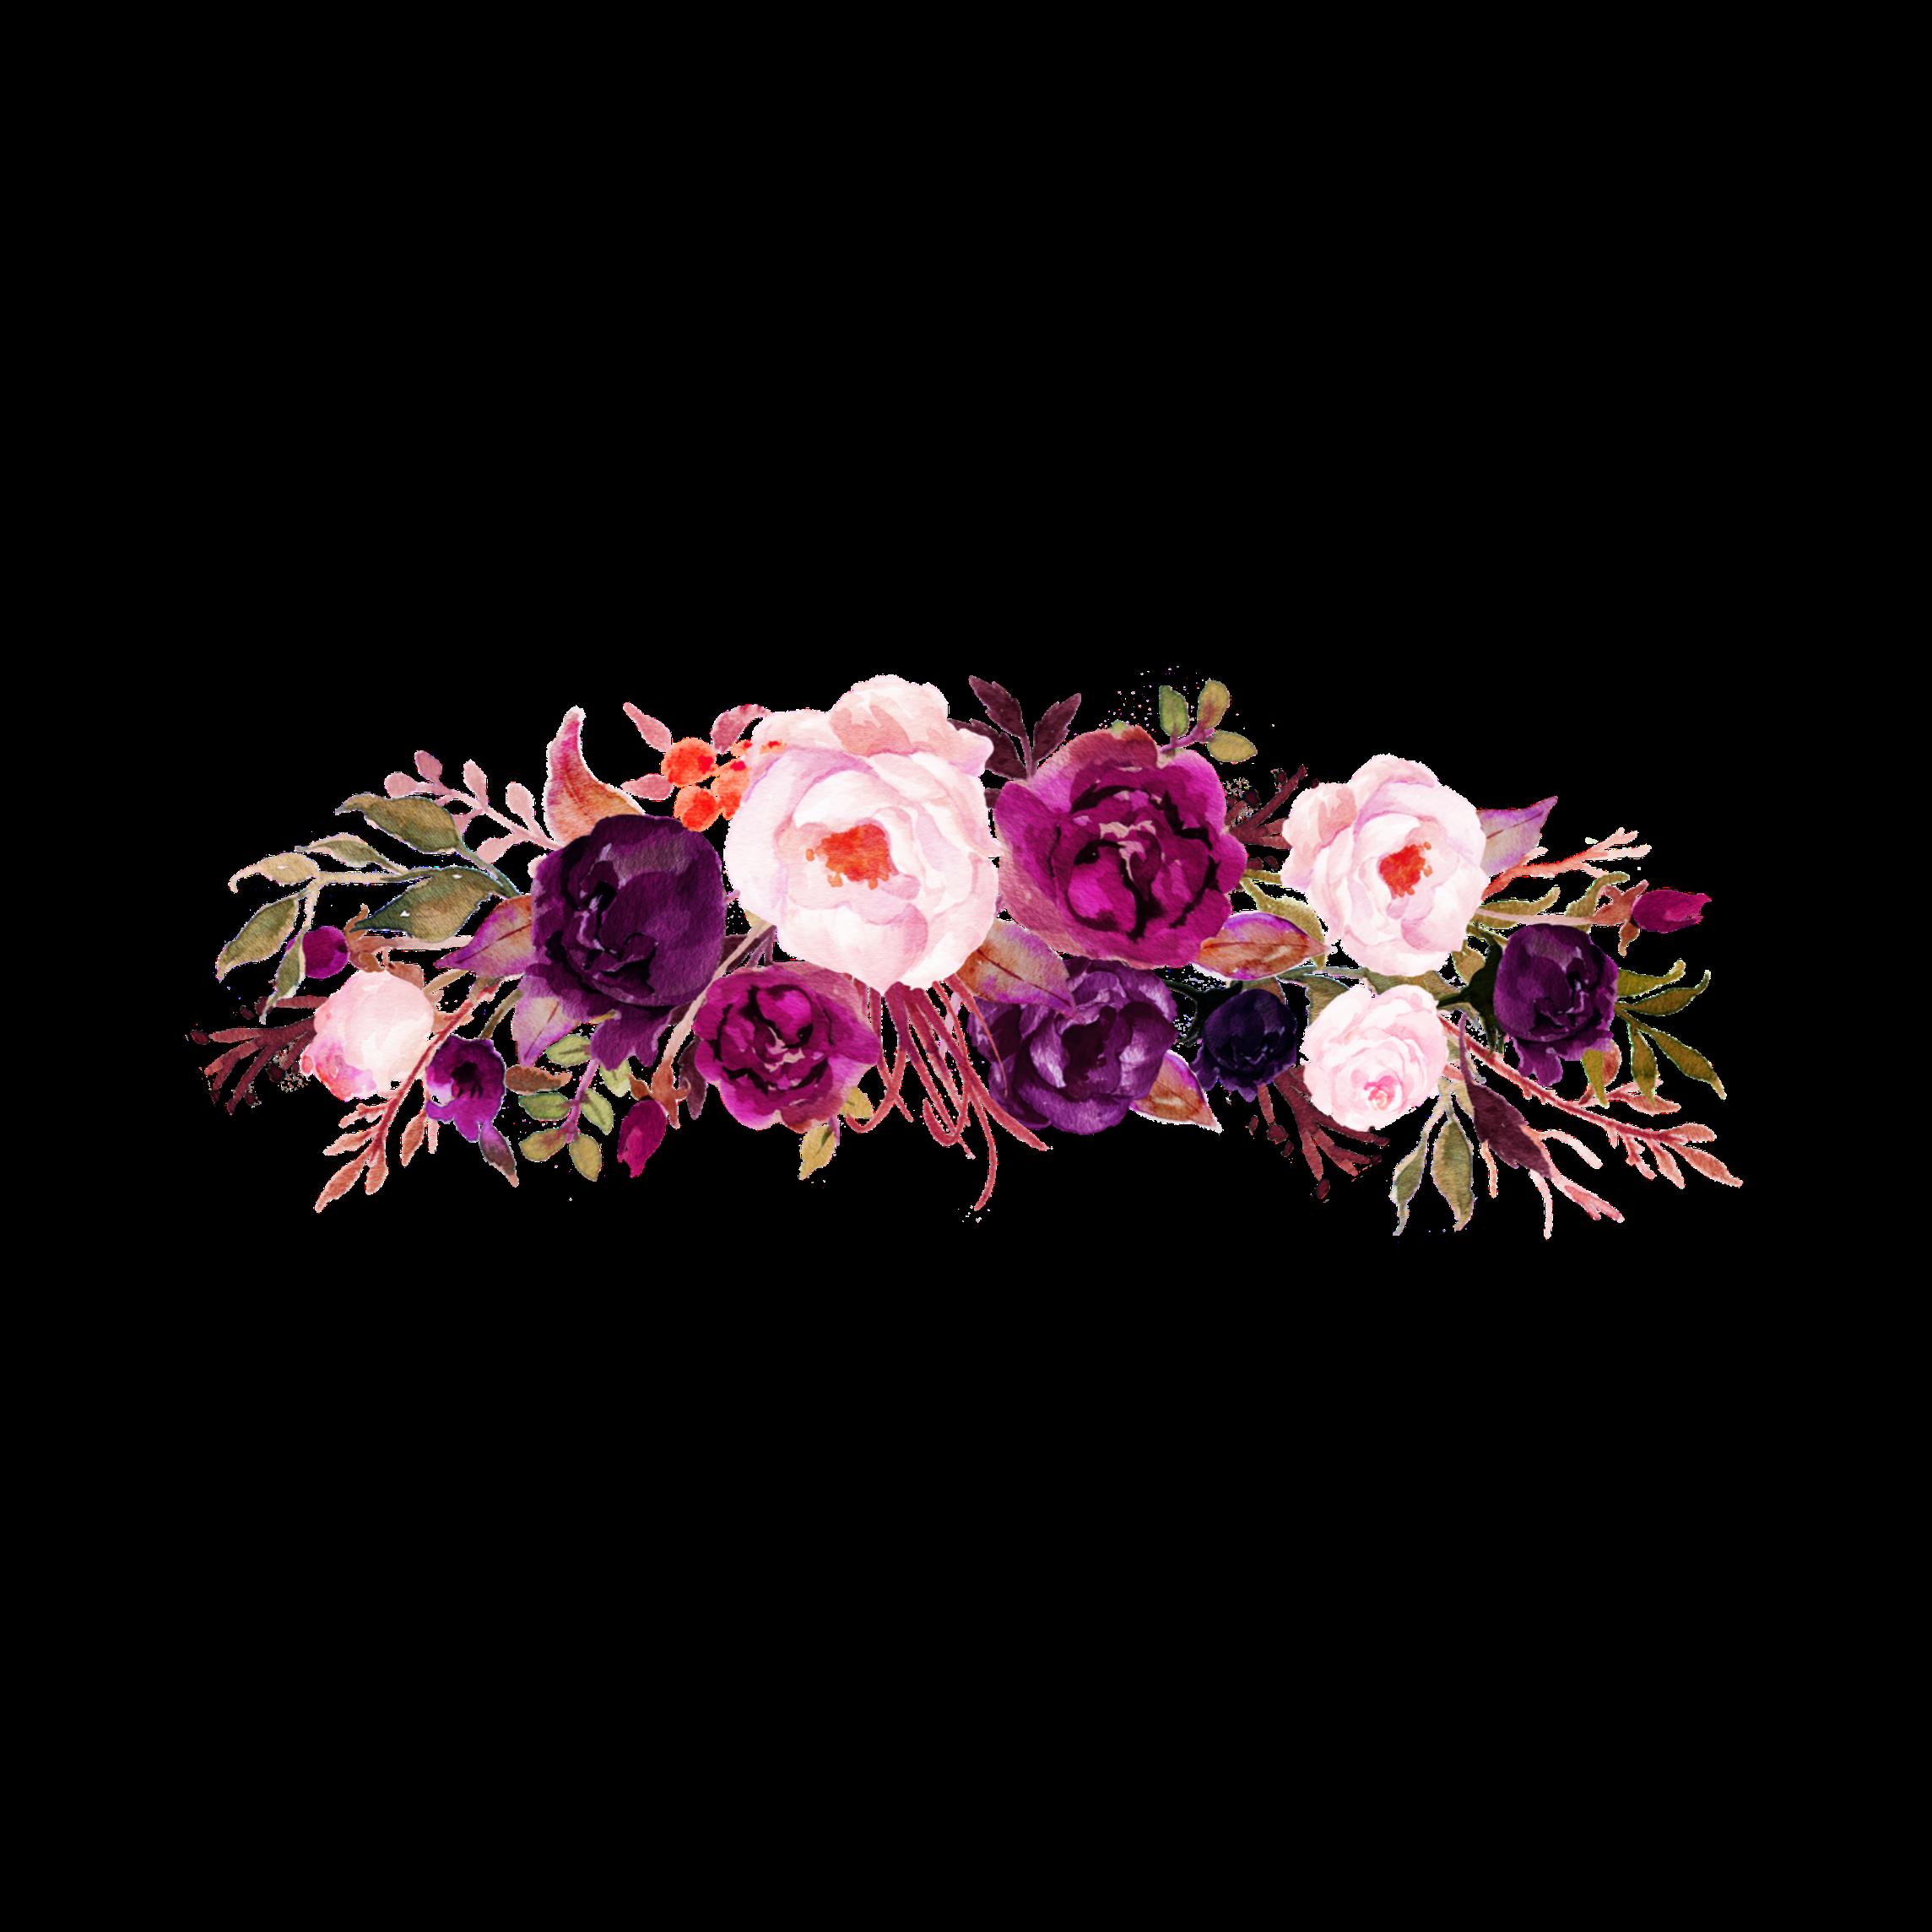 Freetoedit Happytaeminday Tattoo Rose Roses Plants Papyrus Tea ورد ورود زهور بنفسجي بنفسج Remixed From Picsart Rose Tattoos Picsart Rose